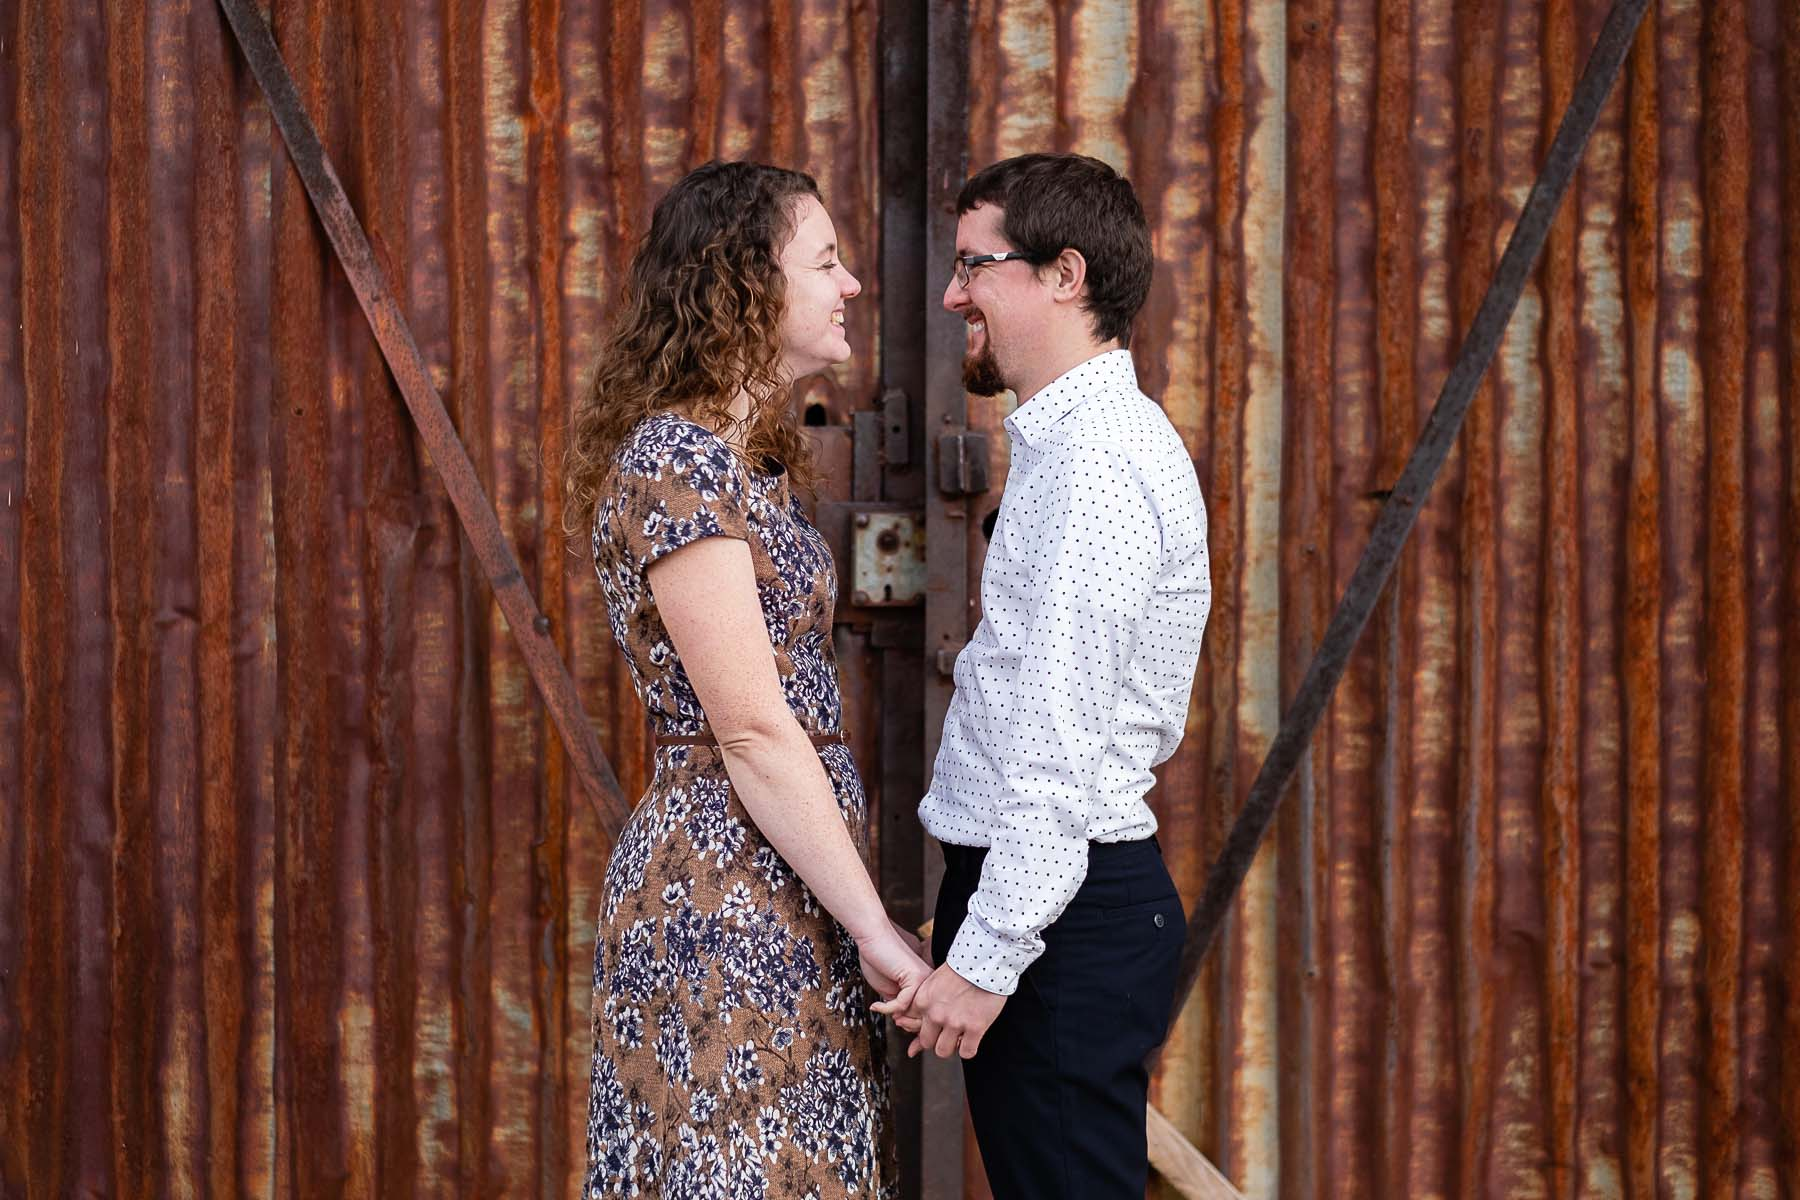 Steeve-Constanty-photographe-professionnel-mariage-couple-portrait-thann-cernay-mulhouse-colmar-guebwiller-soultz-seance-engagement